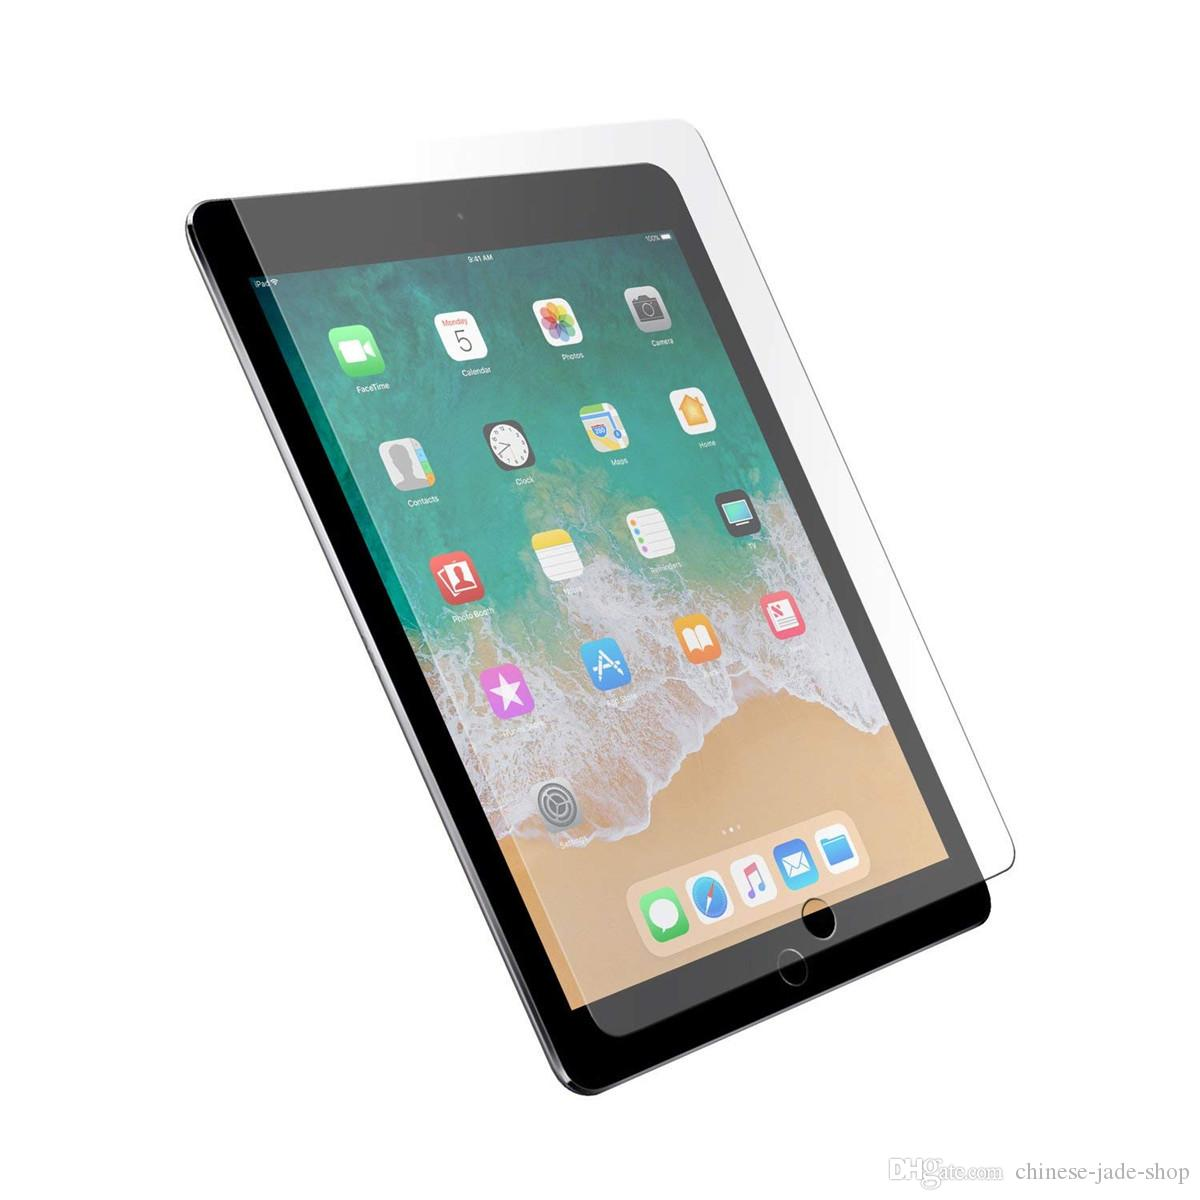 9H 강화 유리 화면 보호기 iPad 10.2 2019 1/2/3 Air 1 Air 2 iPad 2017 2018 Pro 10.5 iPad Pro 11 패키지 500pcs / lot 없음